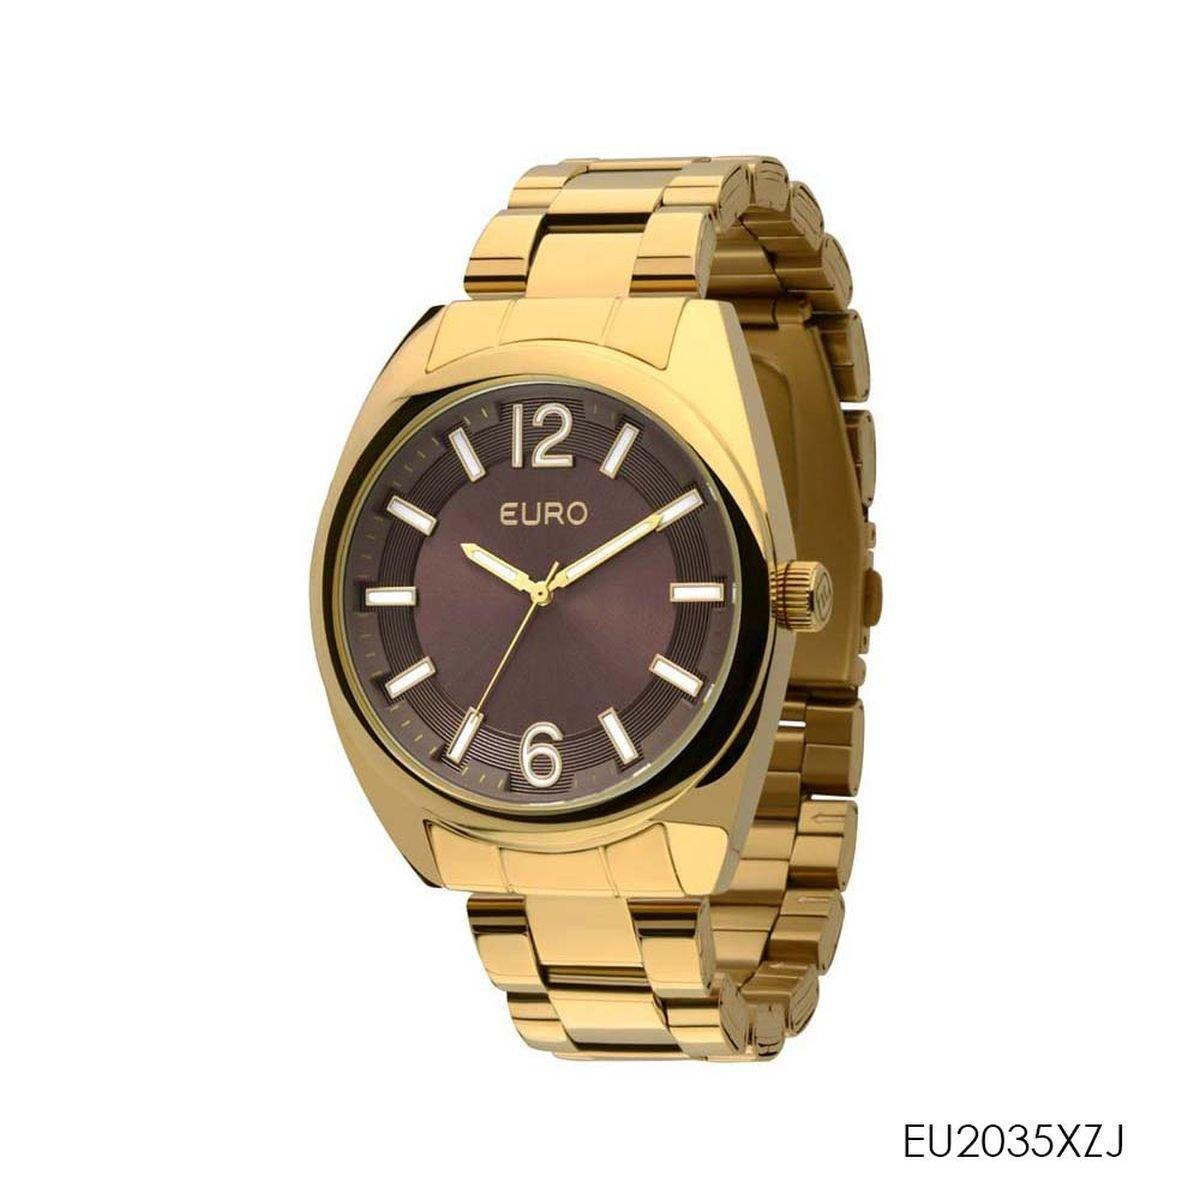 18352ac7b6c94 Relógio Feminino Euro Analógico EU2035XZJ4M Dourado - Zuazen